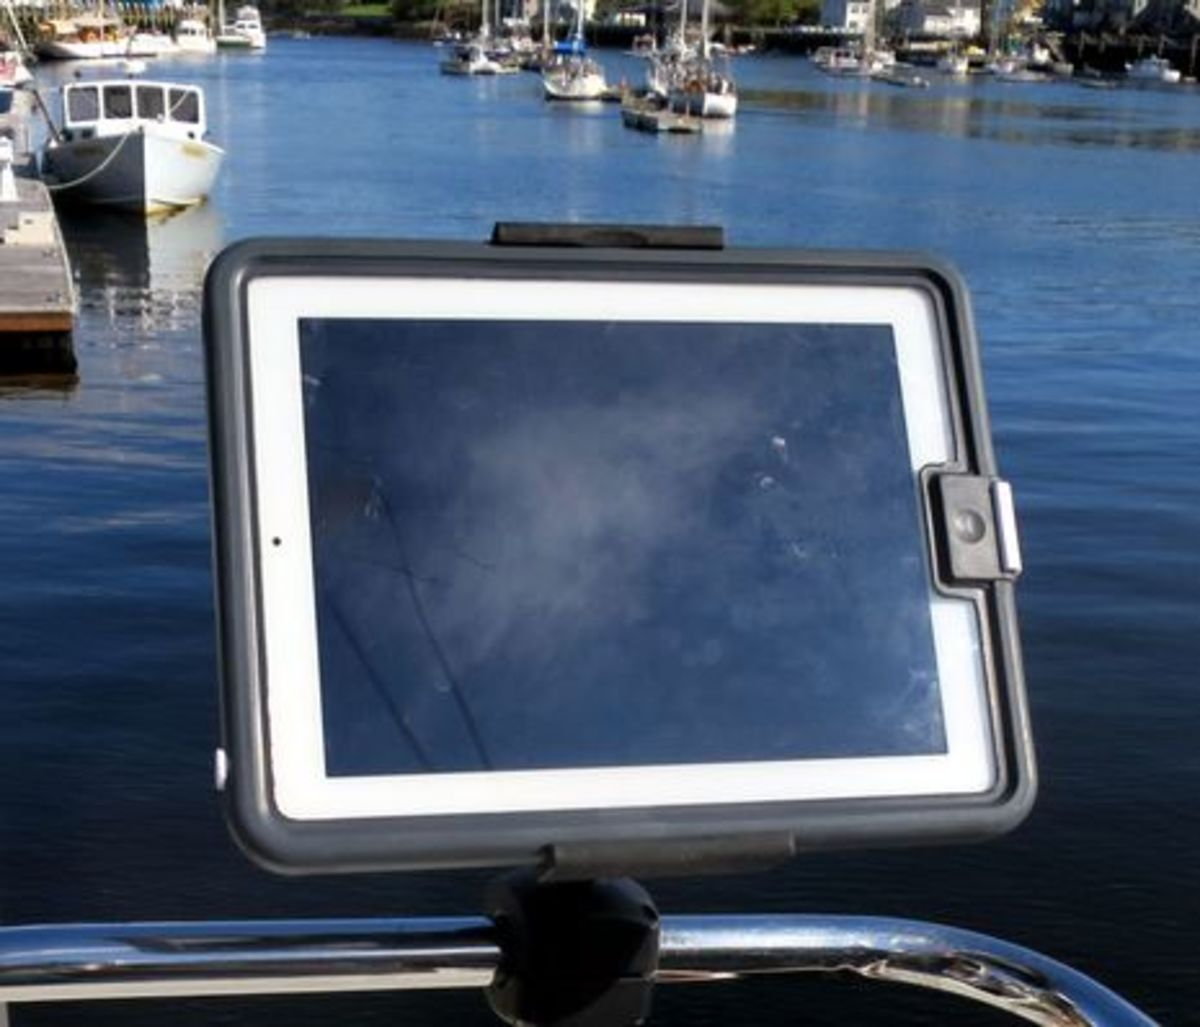 Livedge_iPad_gen2_case_Rokk_mounted_cPanbo.jpg